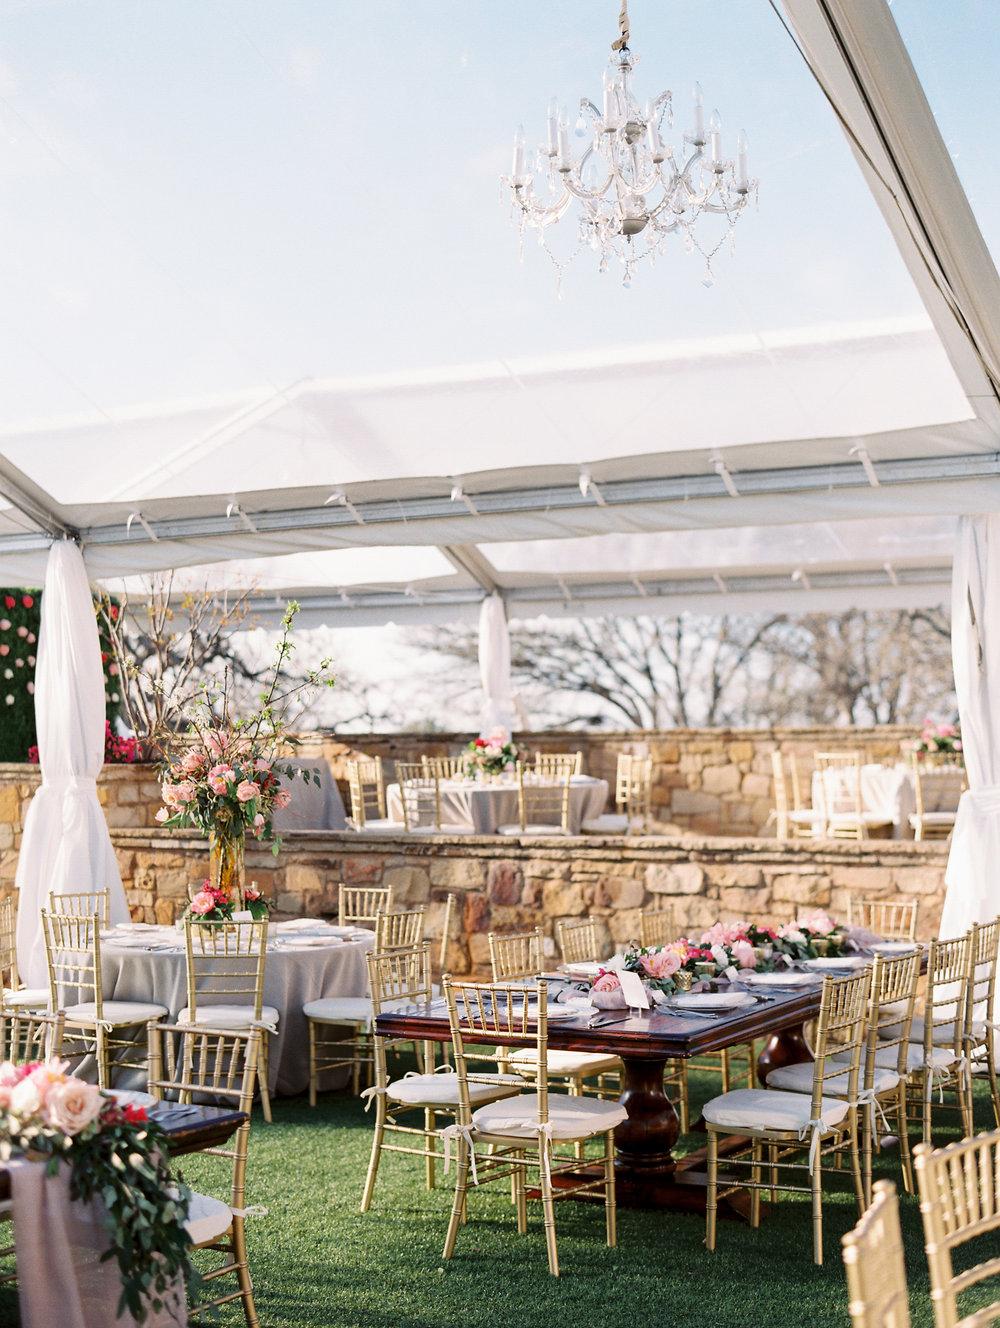 Escondido-Golf_Lake-Club-Hill-Country-Houston-Wedding-Photographer-Best-Top-Luxury-Destination-Engagements-Portrait-Austin-Photography-37.jpg